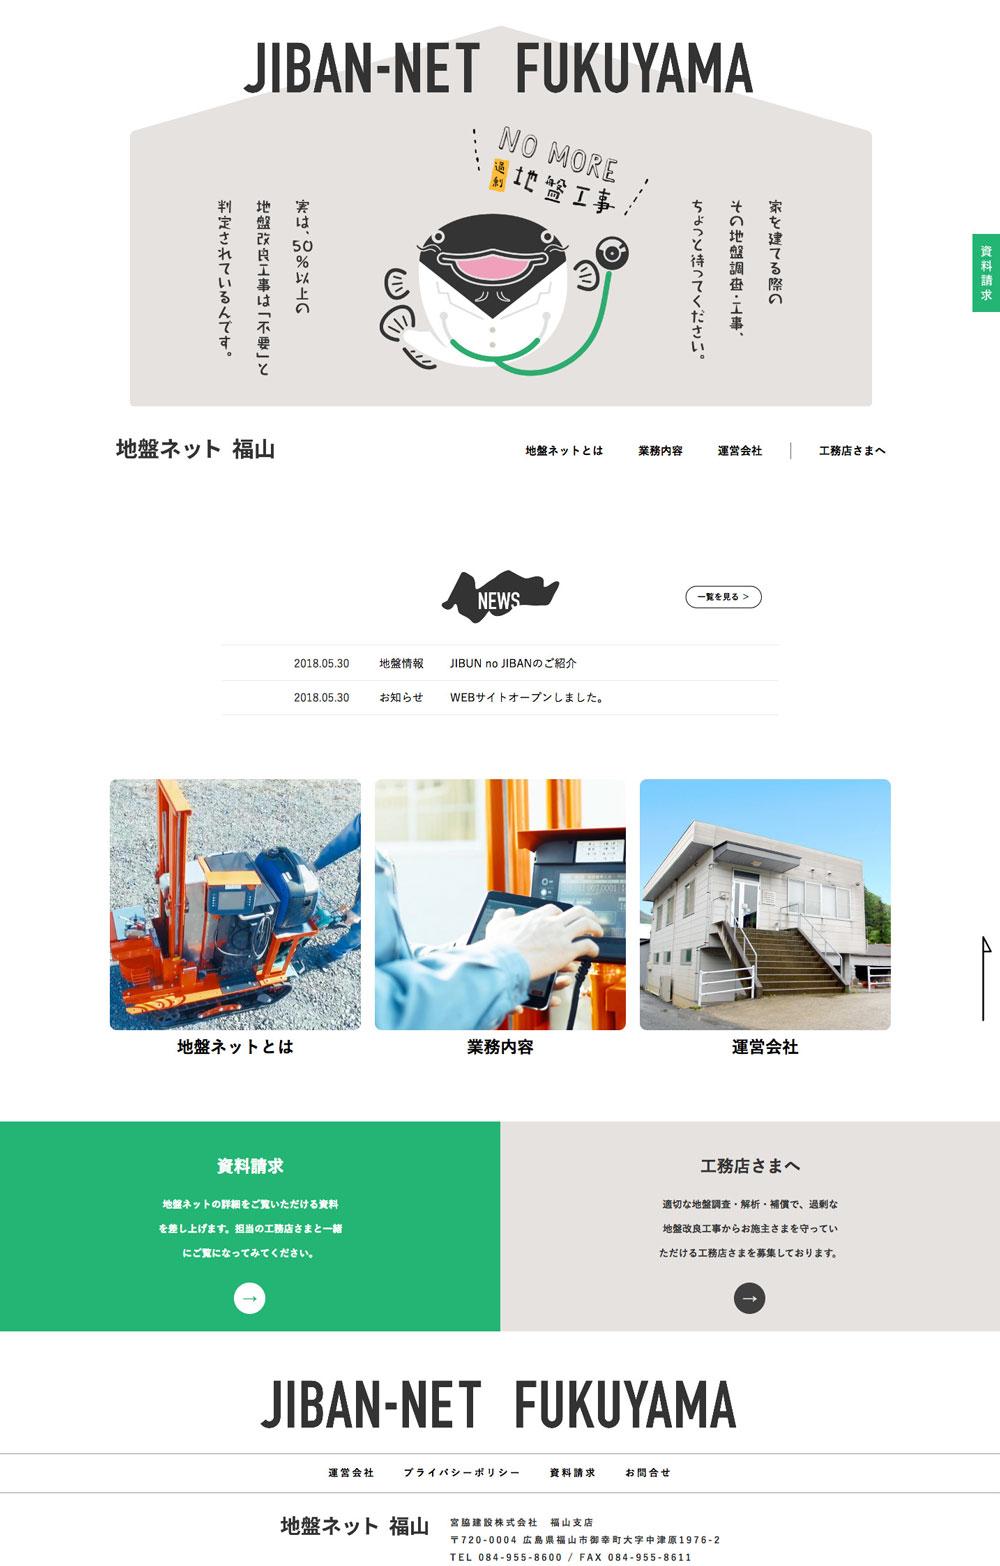 WEBサイトTOPデザイン/地盤ネット福山様制作事例